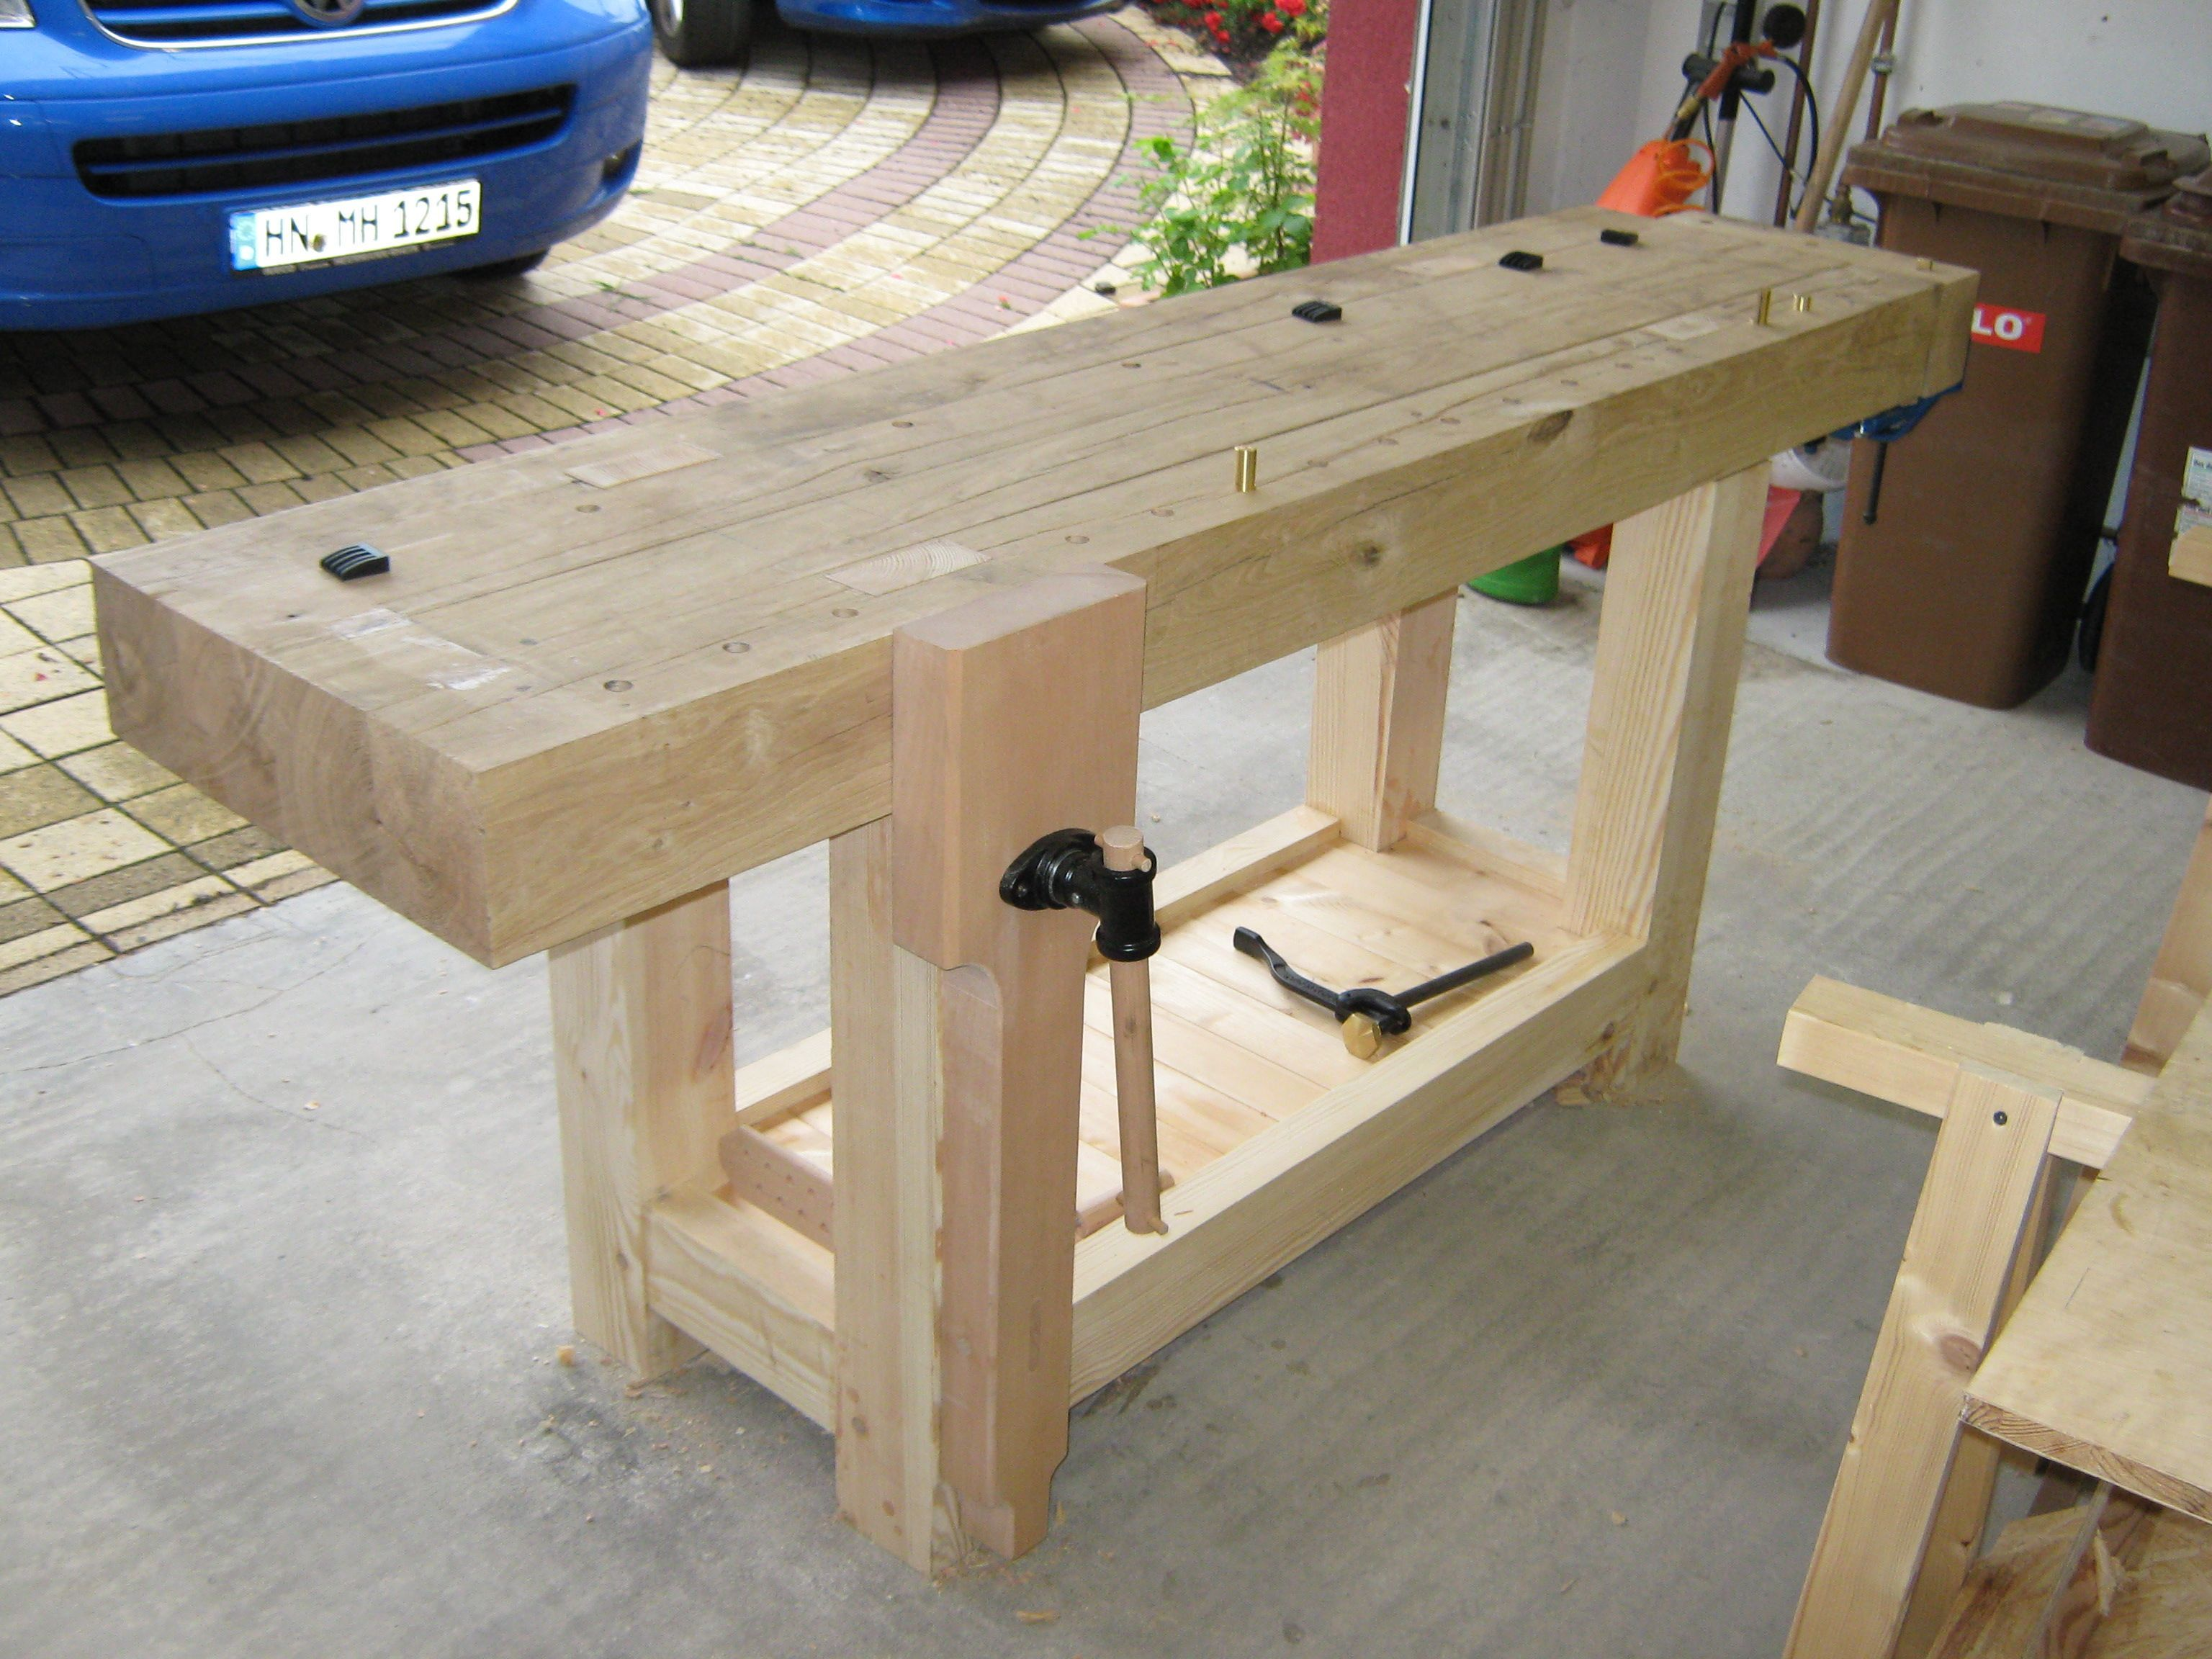 roubo workbench woodworking tools werkbank holz. Black Bedroom Furniture Sets. Home Design Ideas